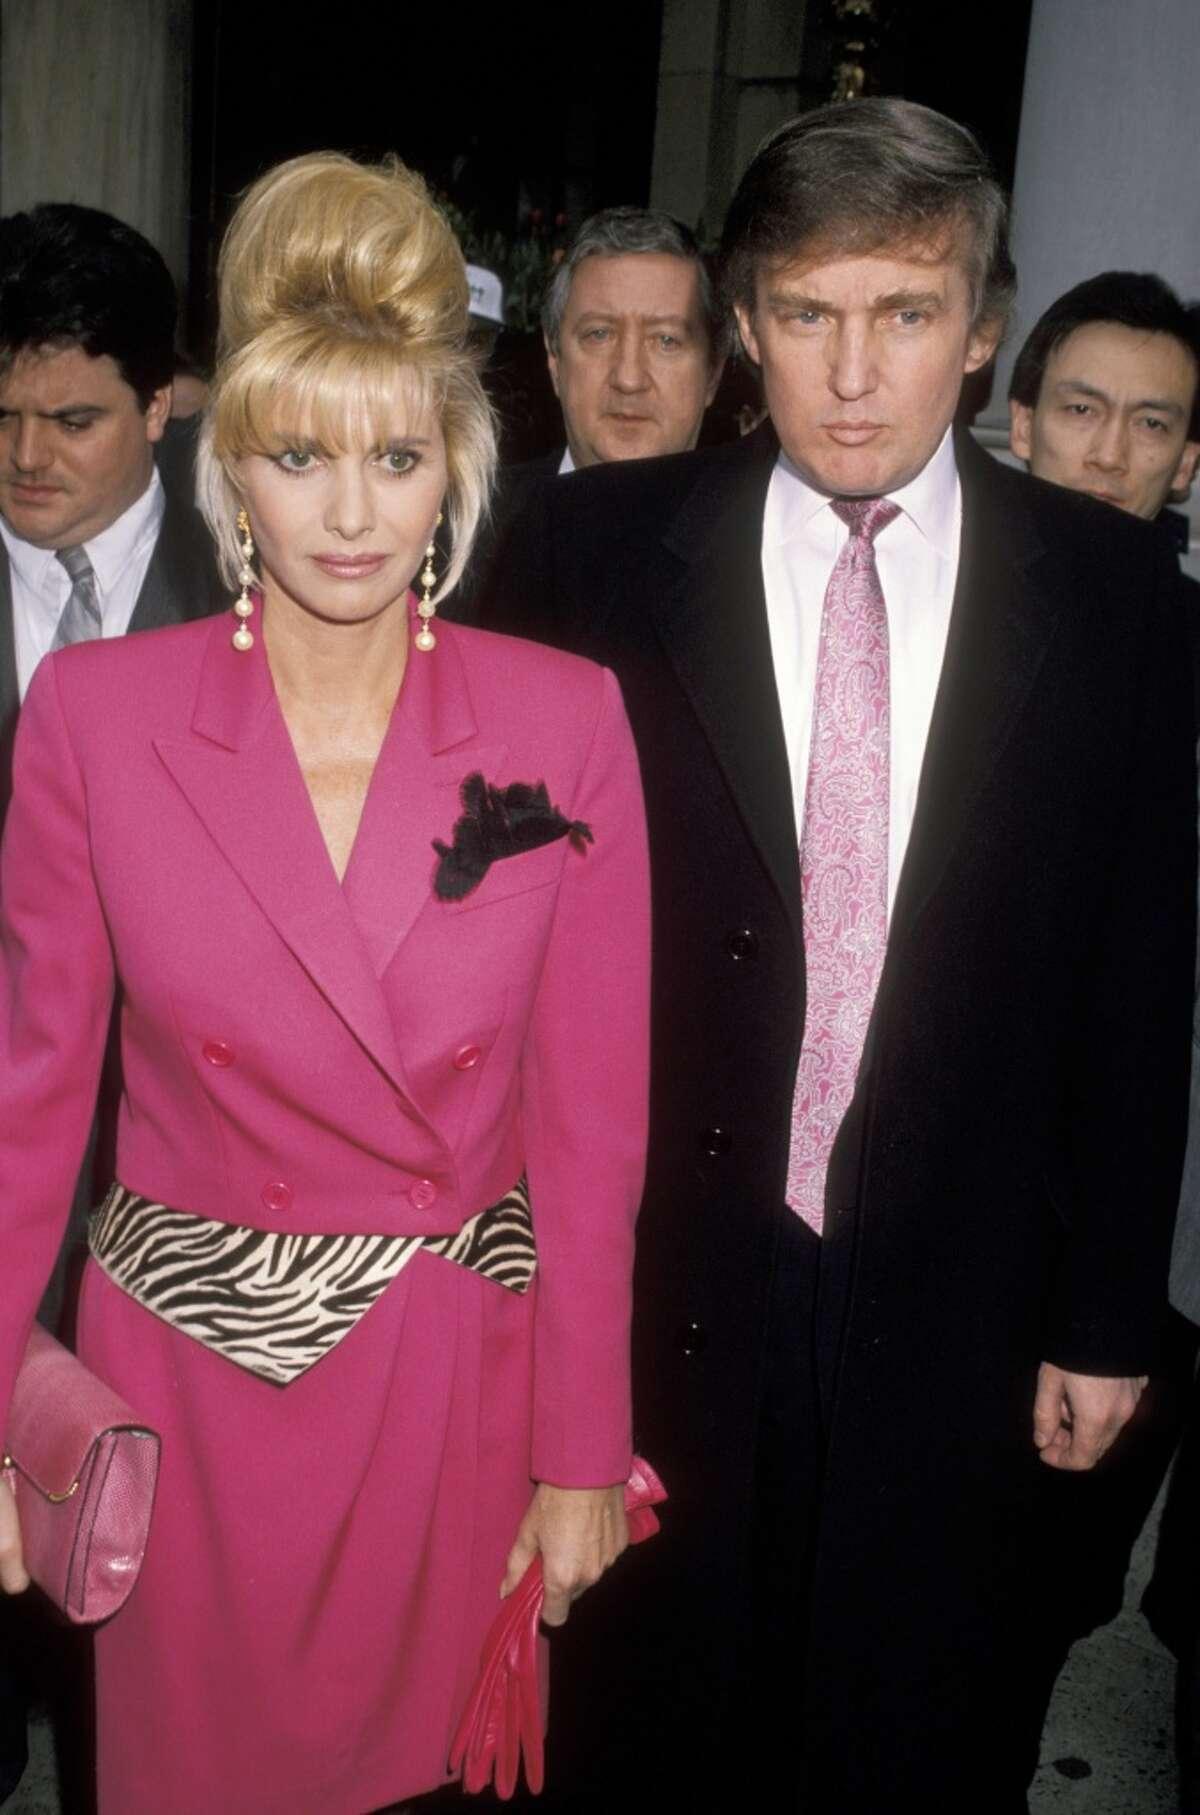 Donald Trump married Czech model Ivana Zelníčková in April 1977. The couple divorced in 1991 with Ivana obtaining an estimated $25 million settlement, including $14 million in cash.